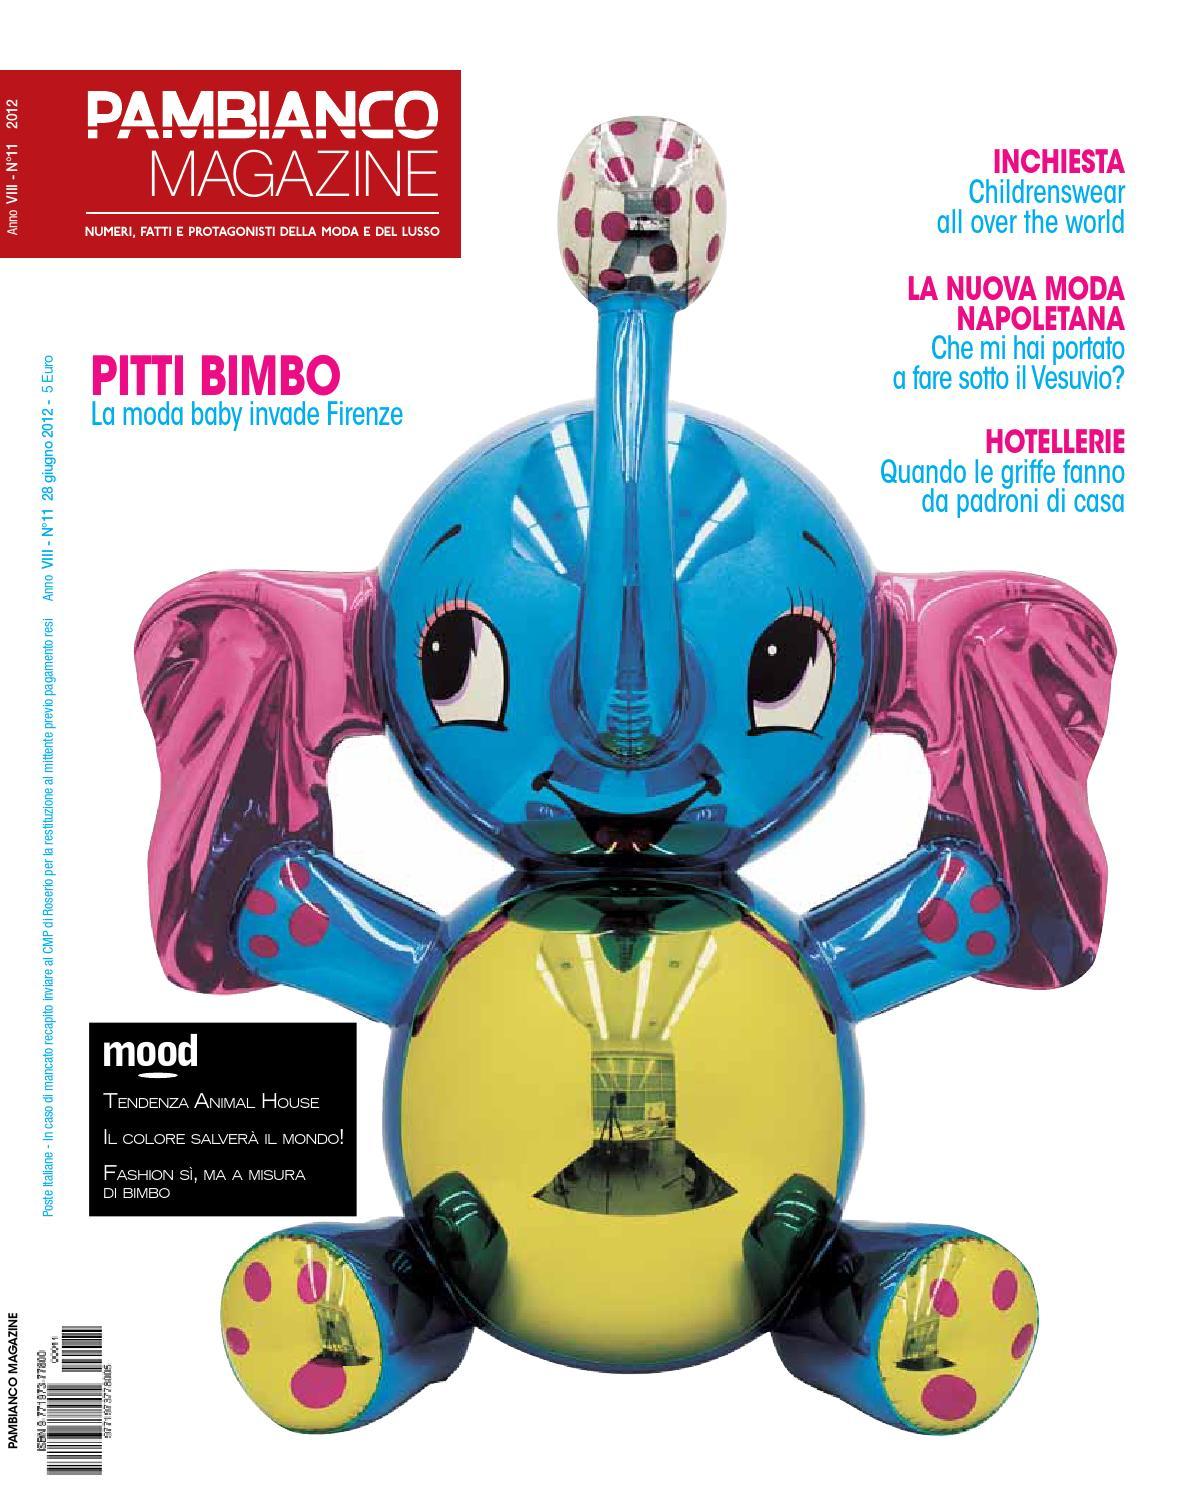 Pambianco magazine N.11 VIII by Pambianconews - issuu 57bbb13b9c4